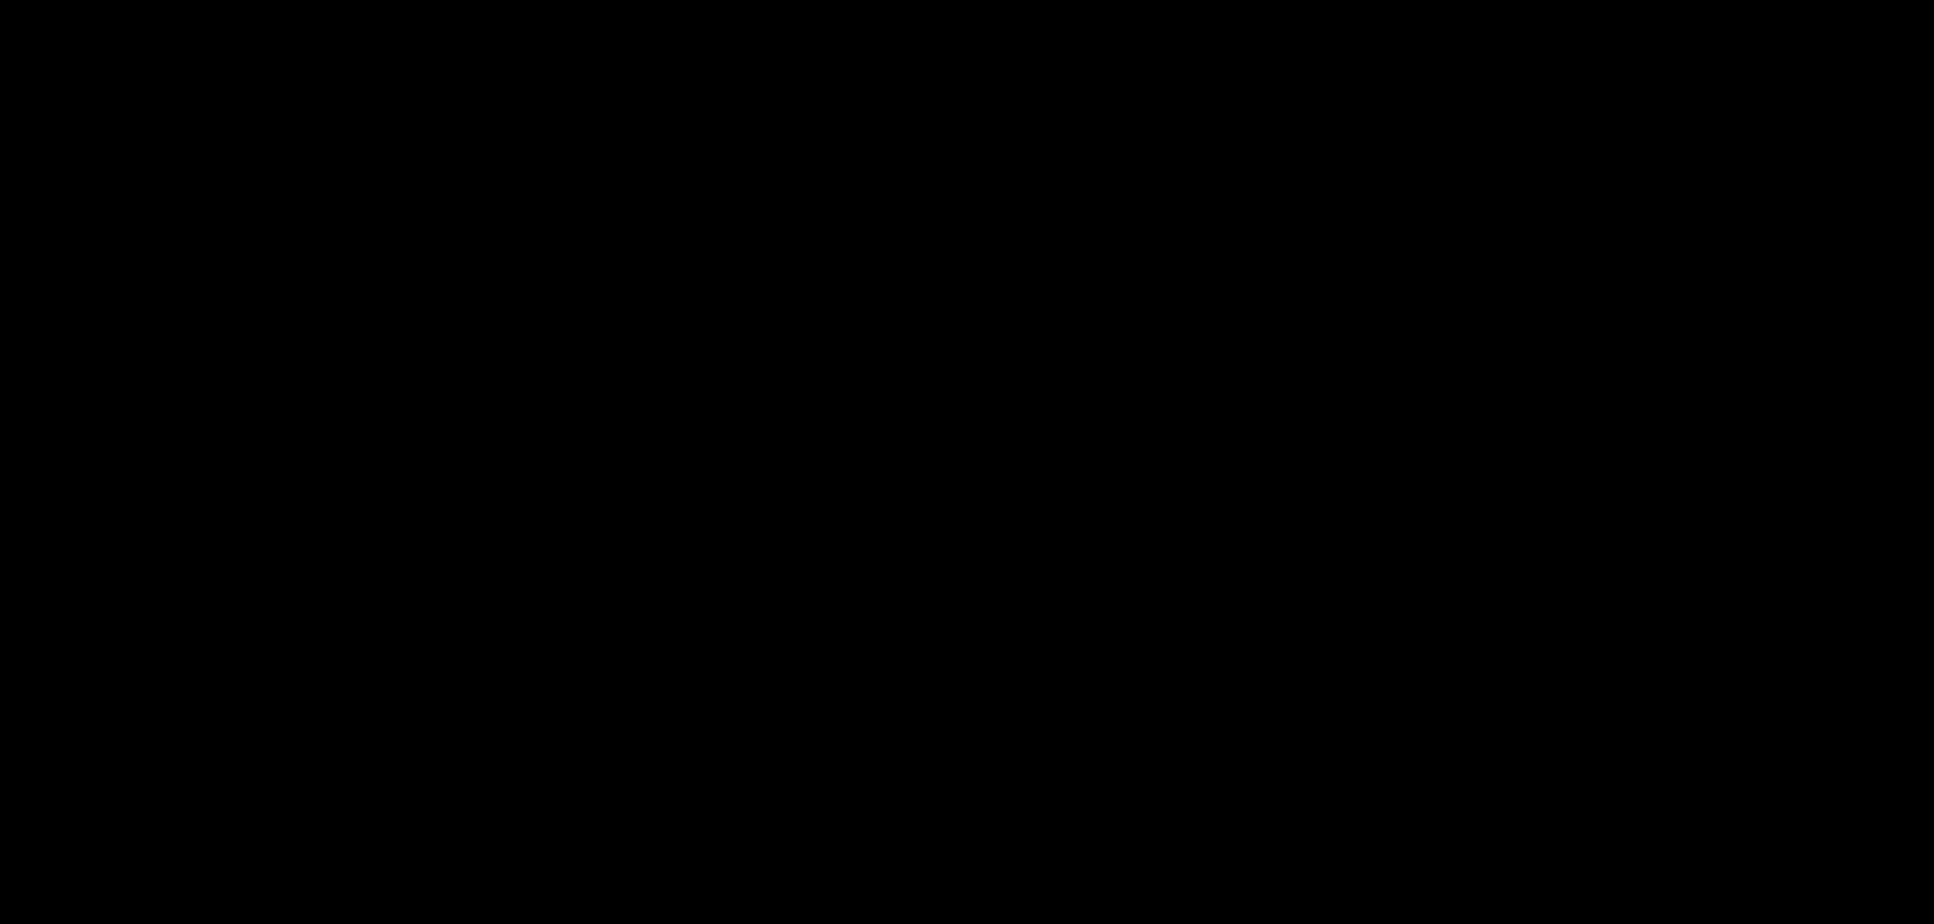 7-Dansyl-N-hydroxyheptanamide